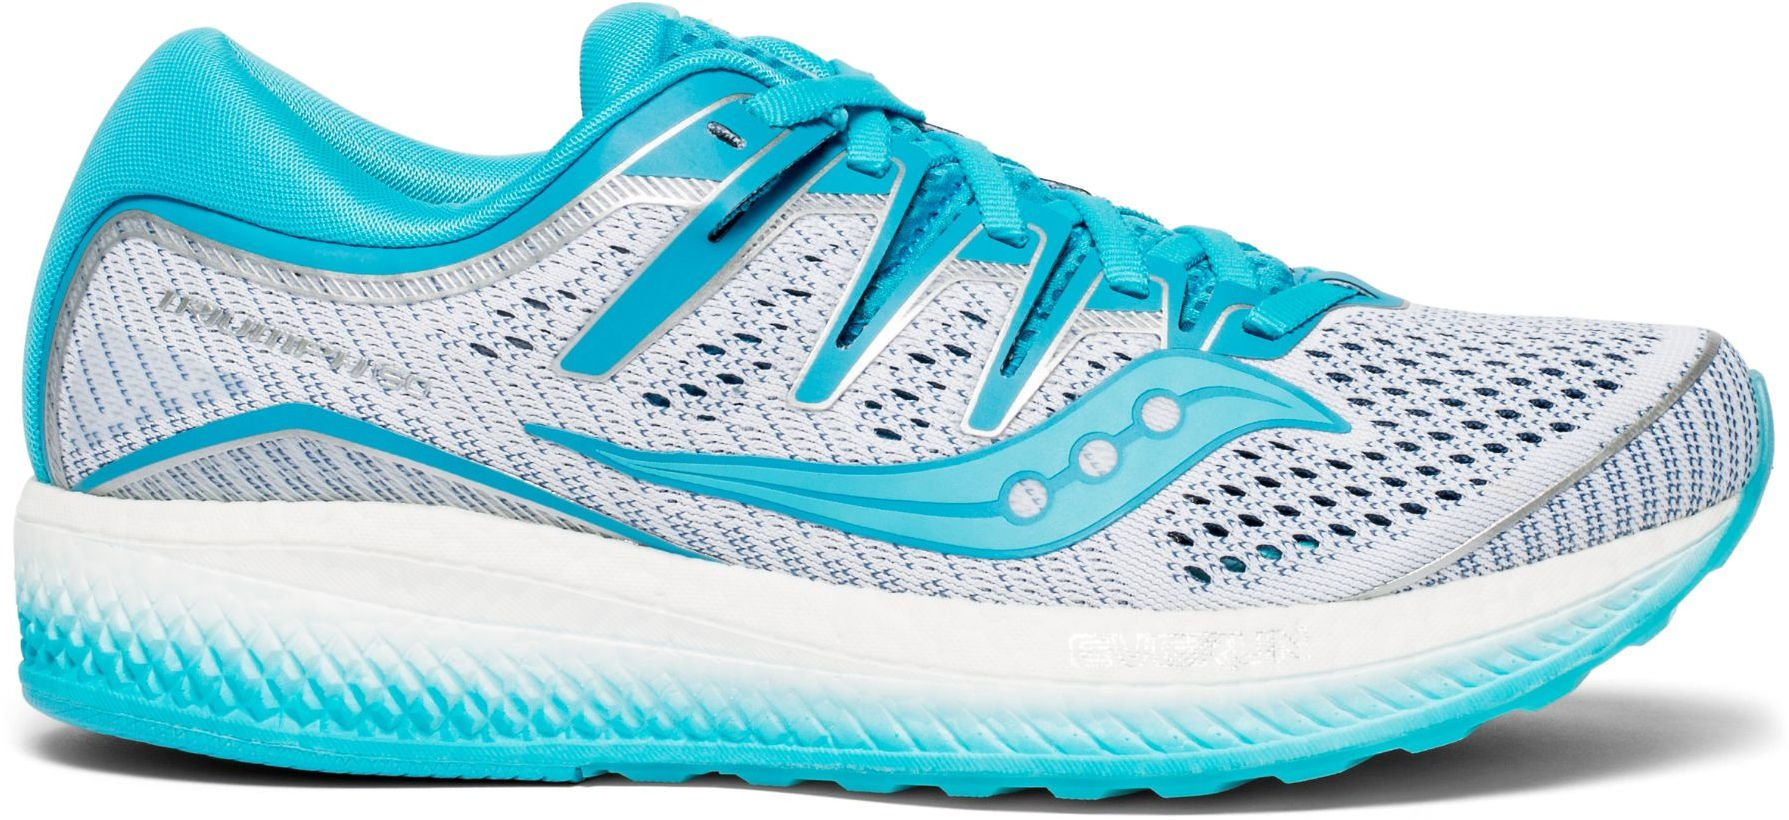 Zapatillas de running Saucony SAUCONY TRIUMPH ISO 5 s10462 36 Talla 40,5 EU | 7 UK | 9 US | 25,5 CM